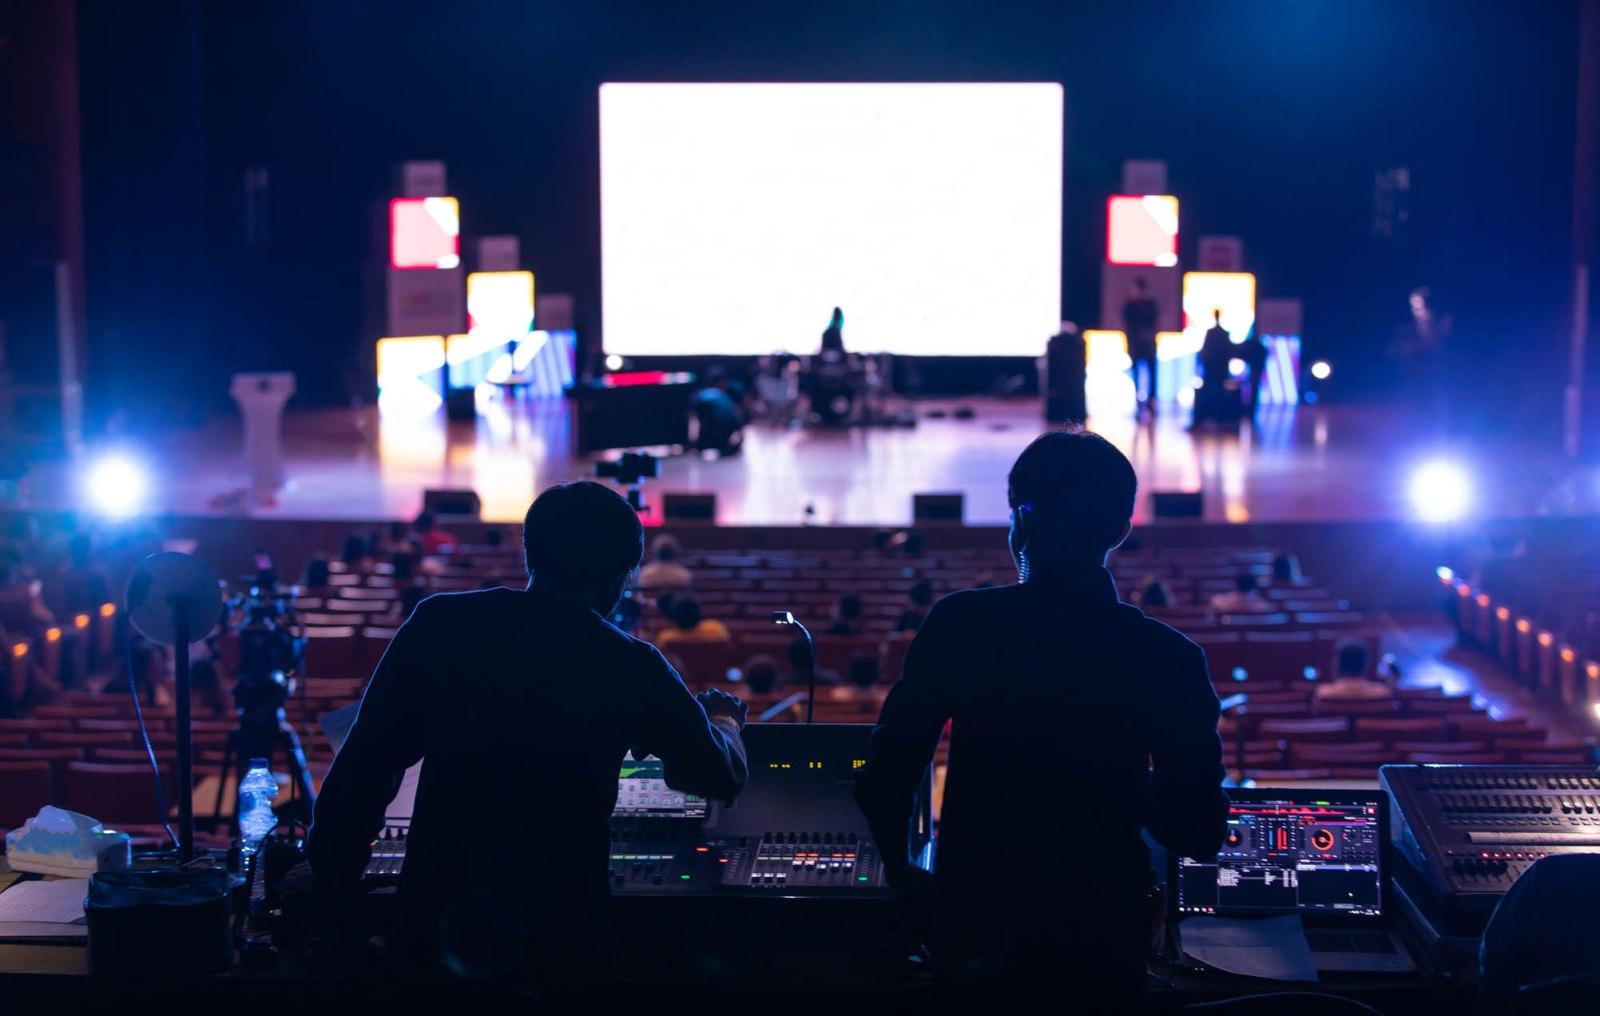 soundwave art for events